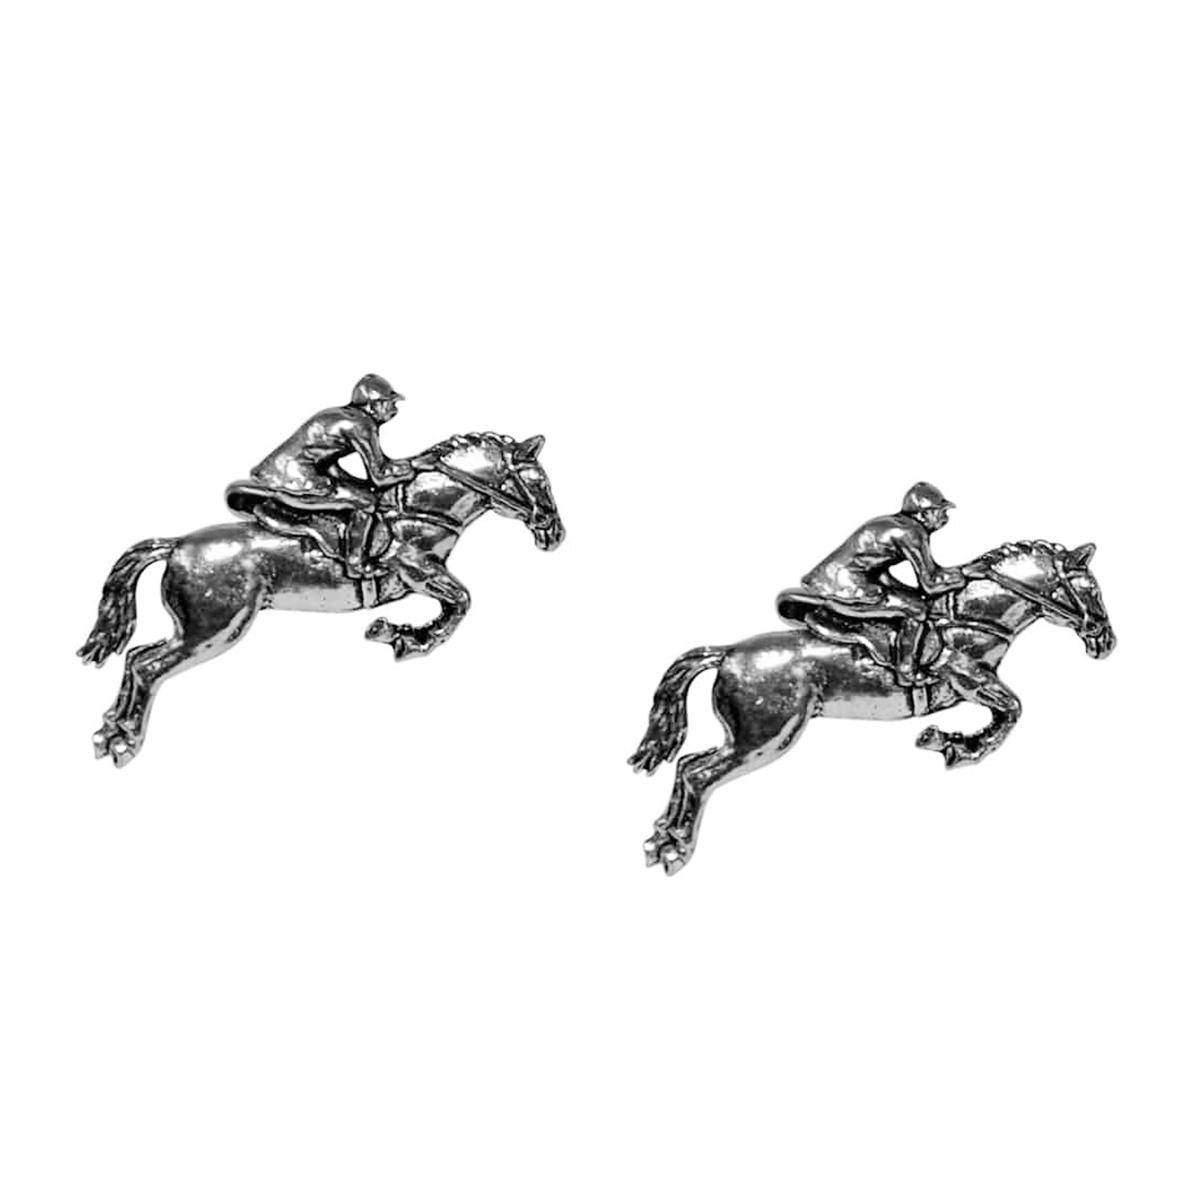 3inch kilt pin,bookmark,black cord,Split keyring,Platinum Dressage E03 Horse /& Equestrian Fine English Pewter Cufflinks,Tie slide